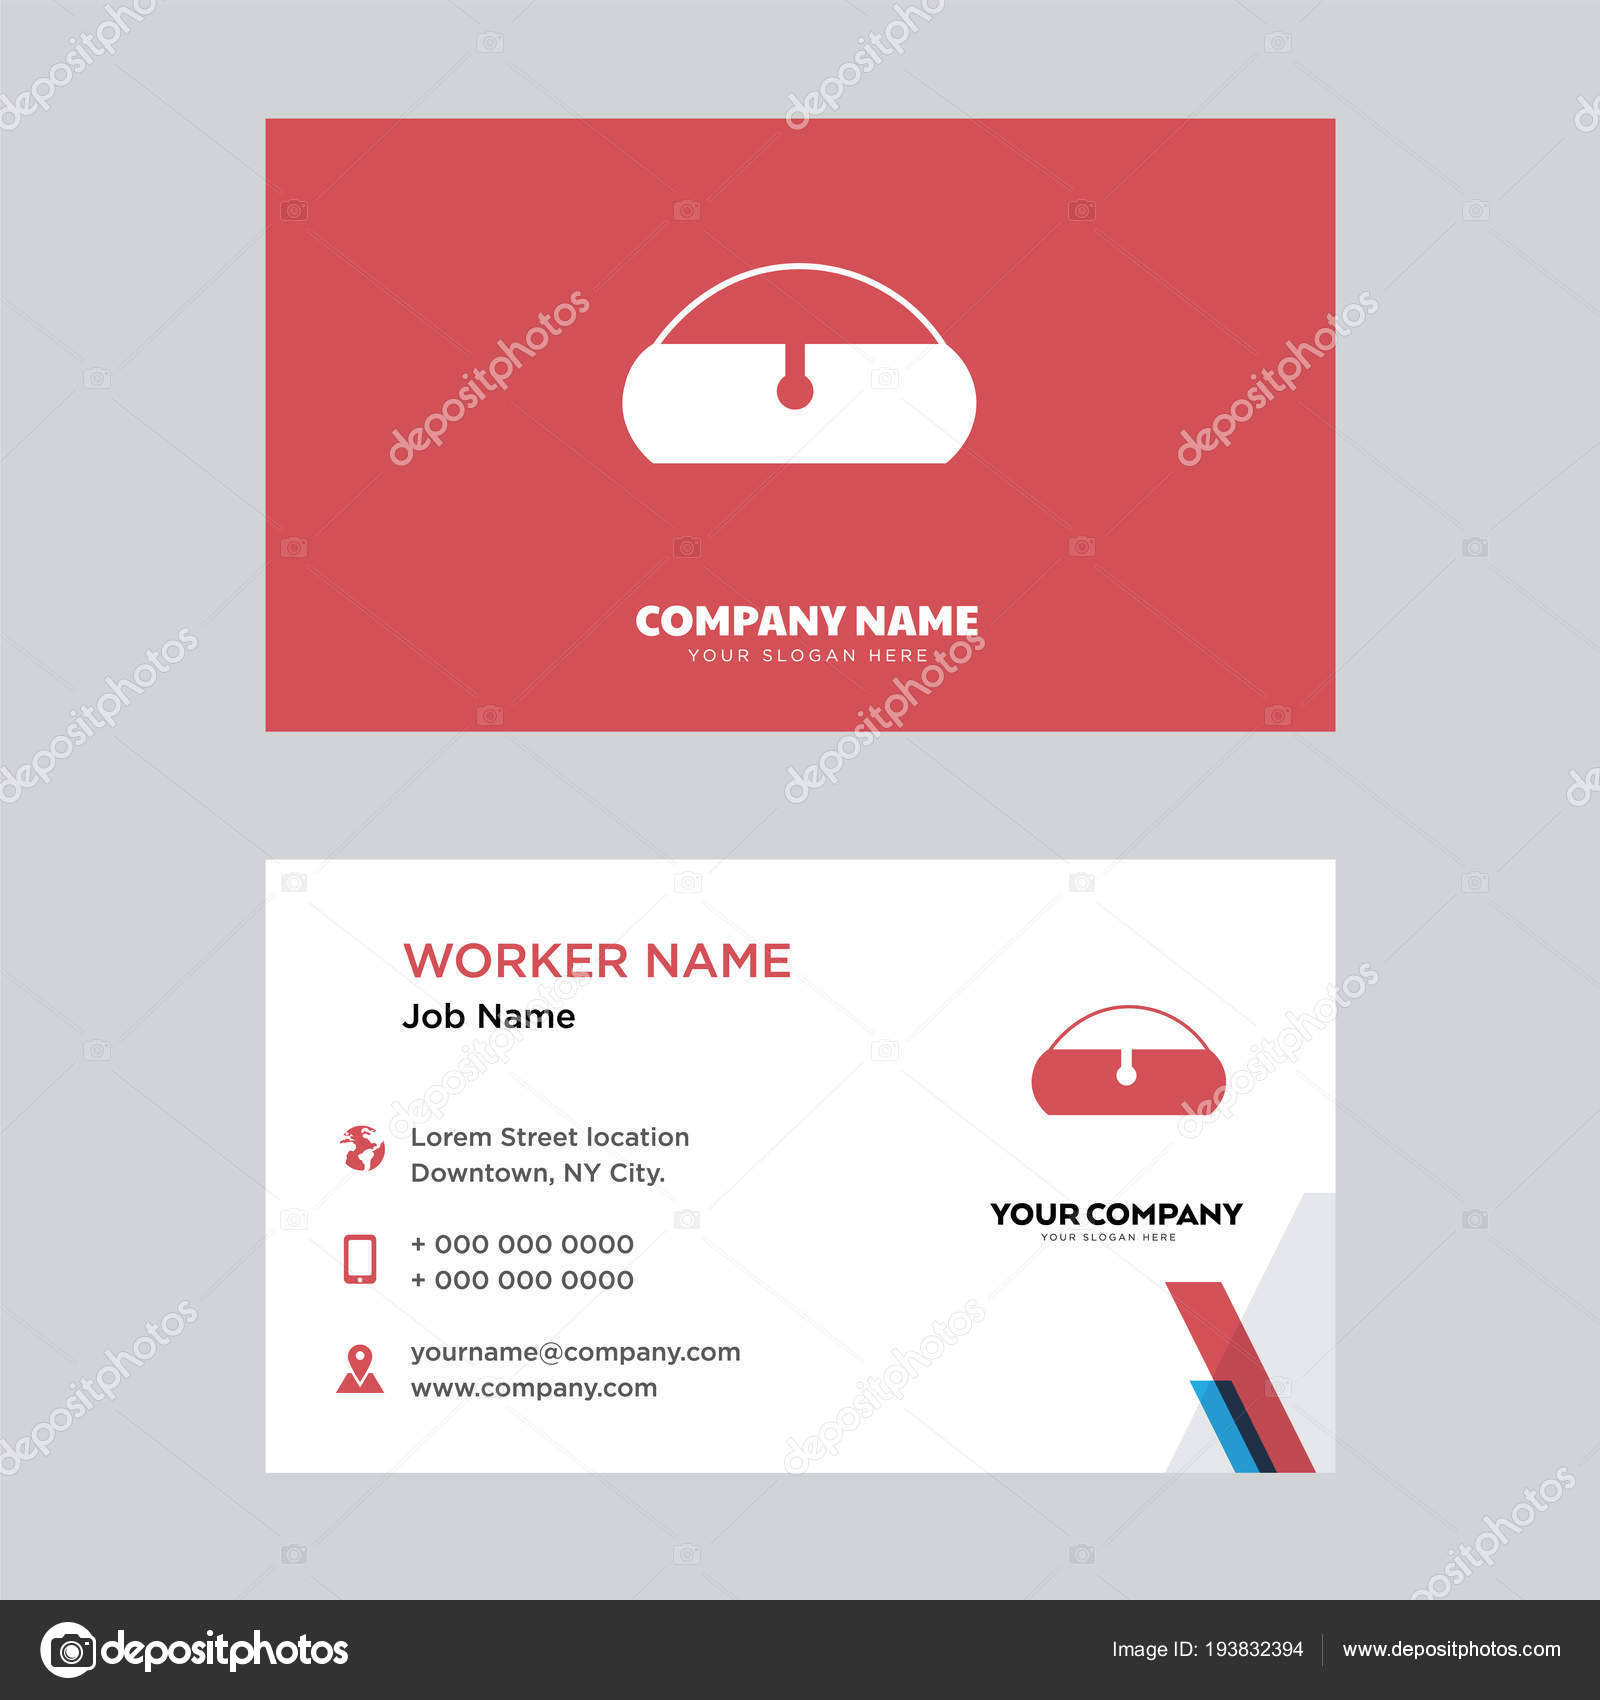 Rectangular pouch bag business card design — Stock Vector ...